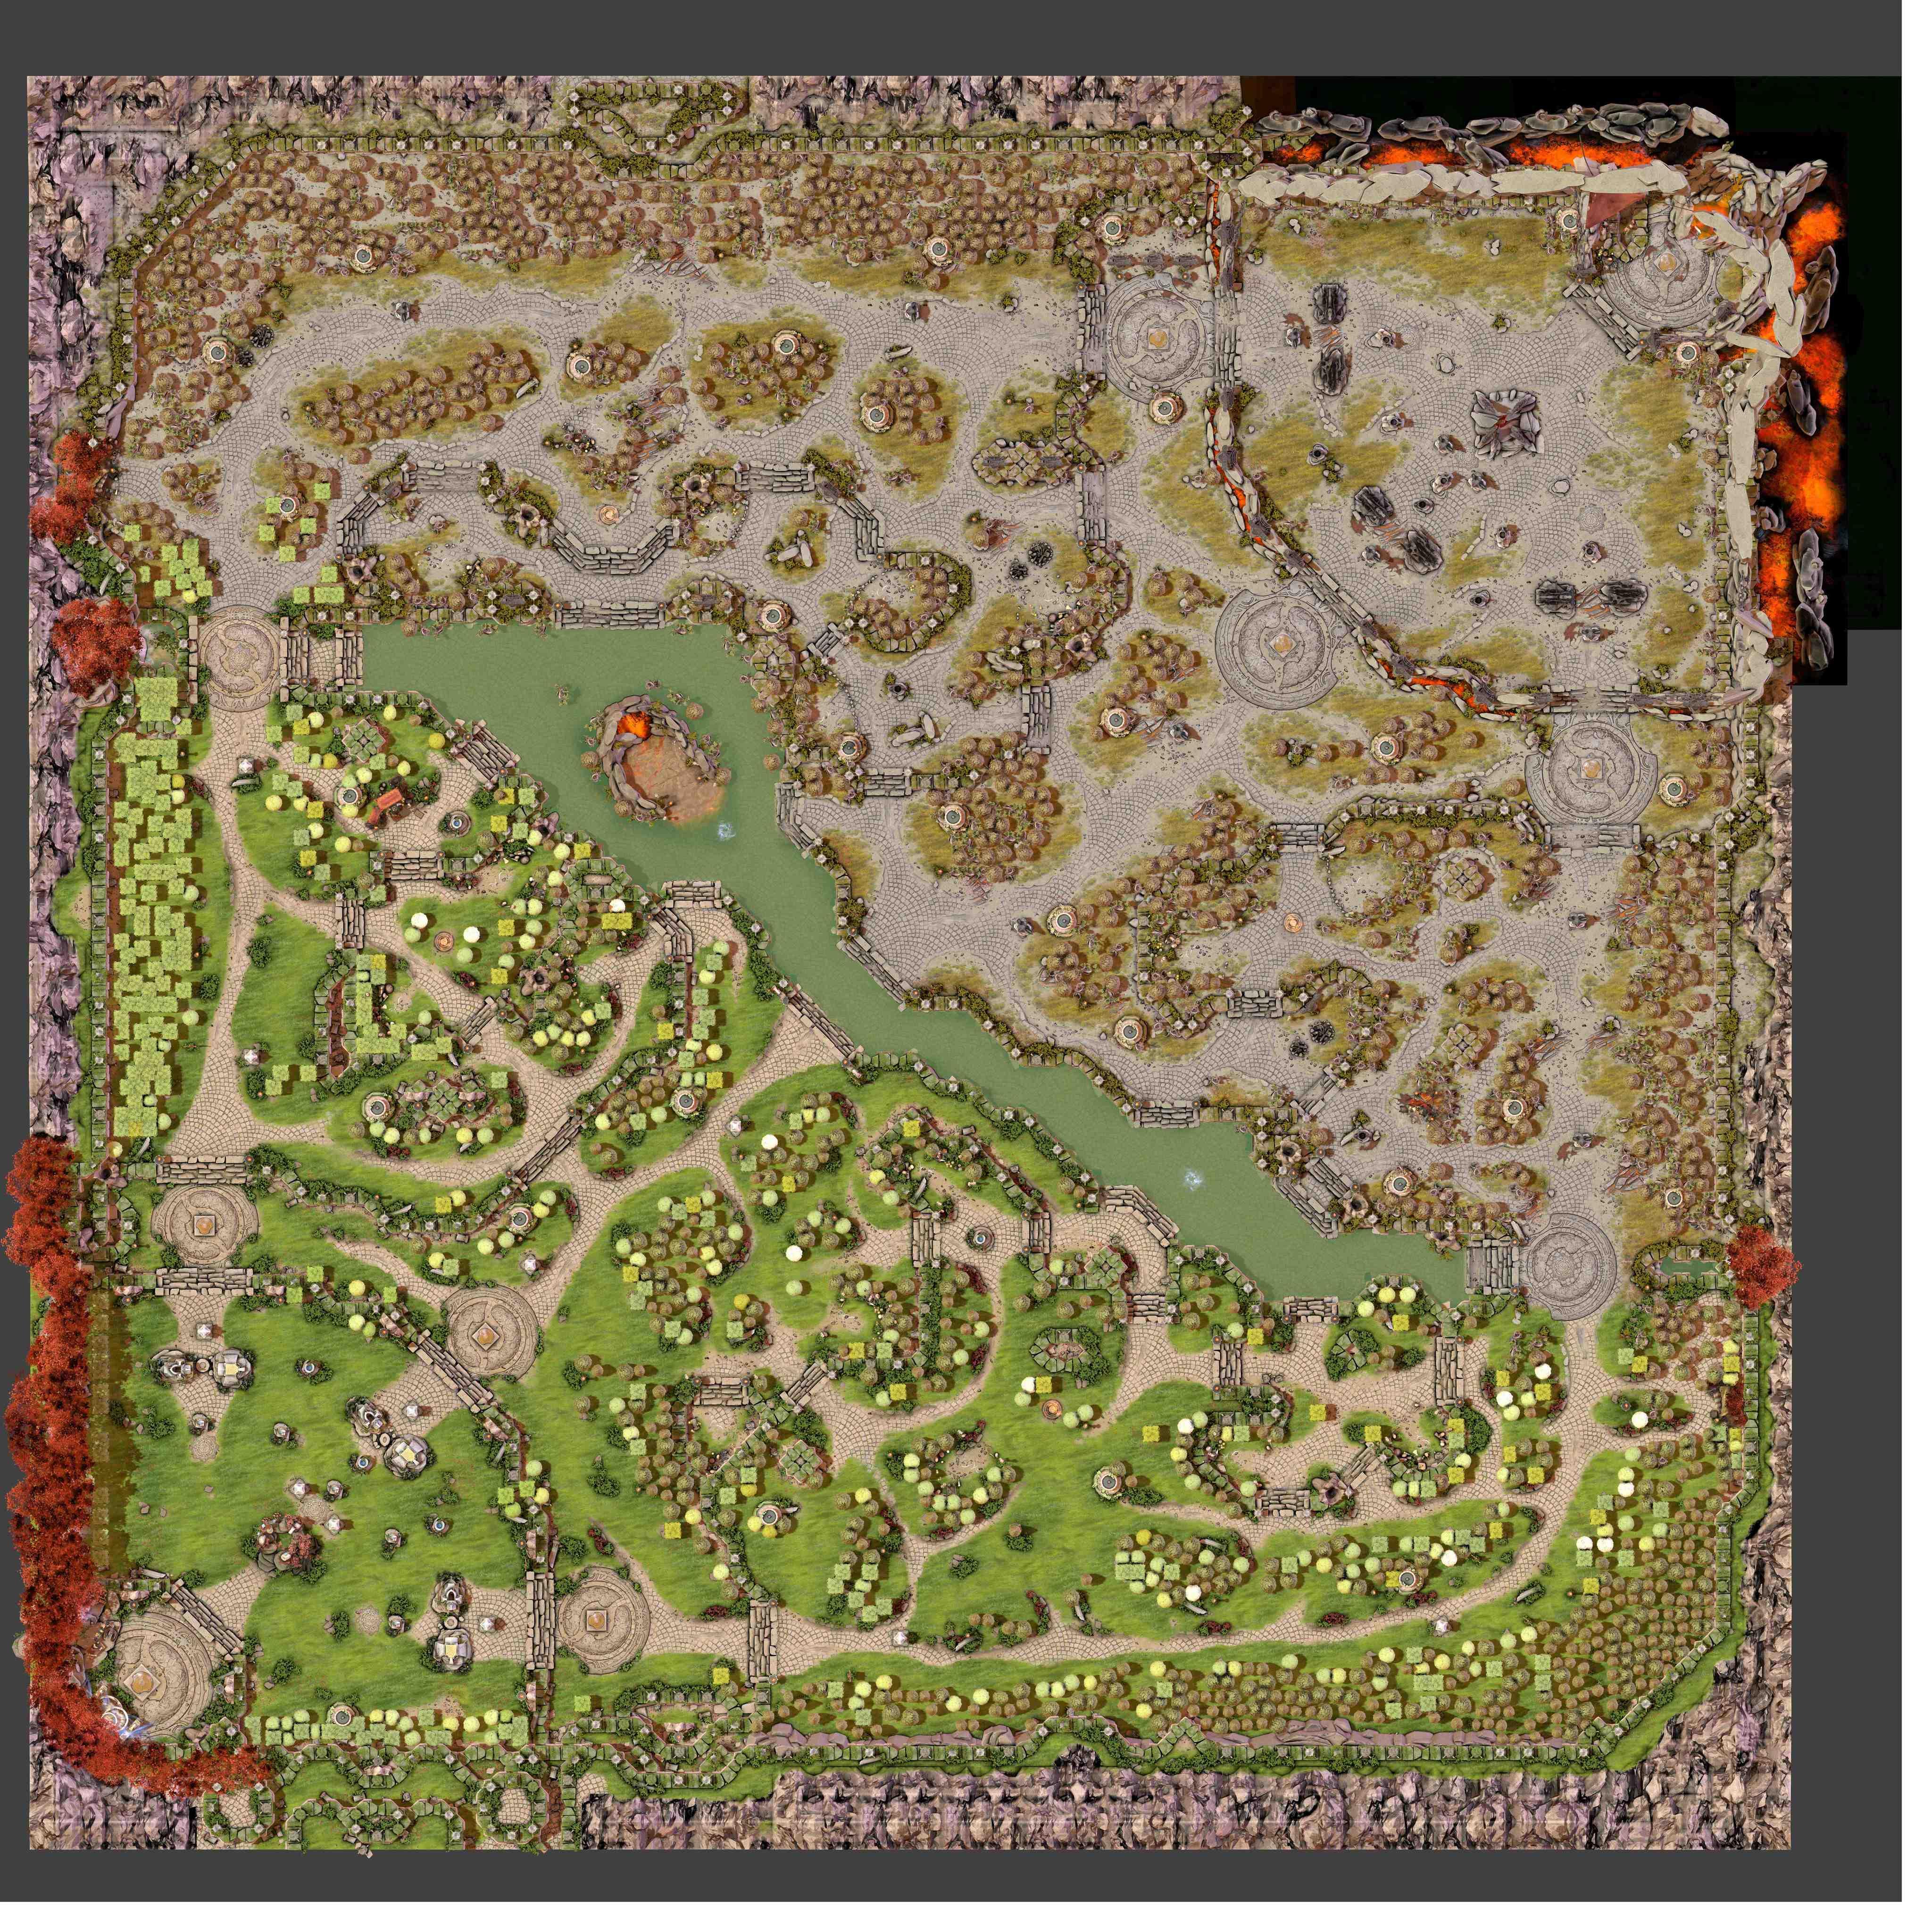 Dota 2 Map Images